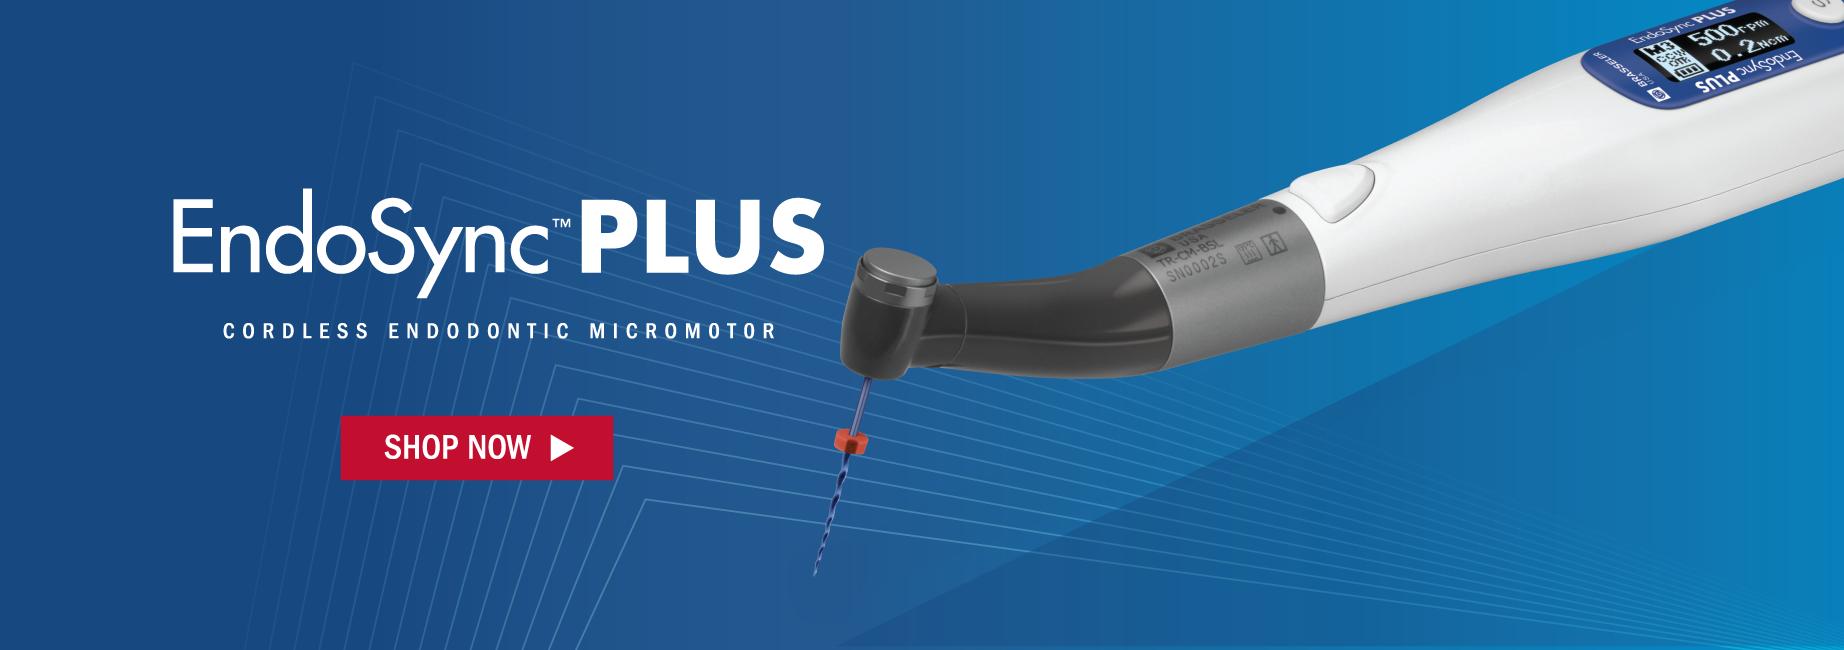 EndoSync Plus. Cordless Endodontic Micromotor. Shop Now.